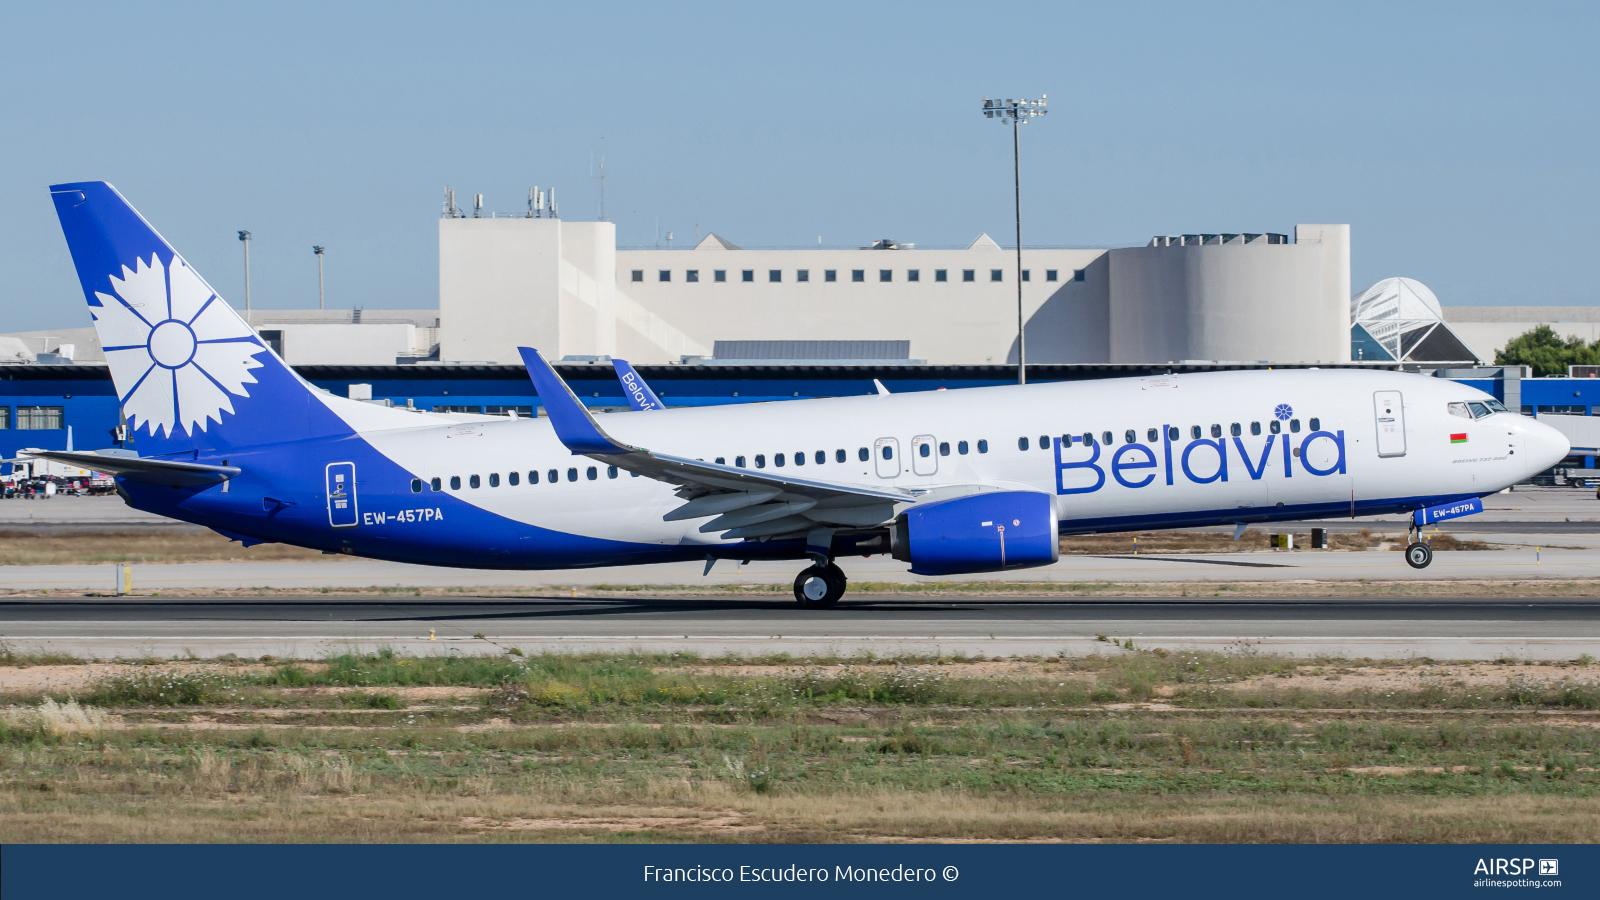 Belavia  Boeing 737-800  EW-457PA